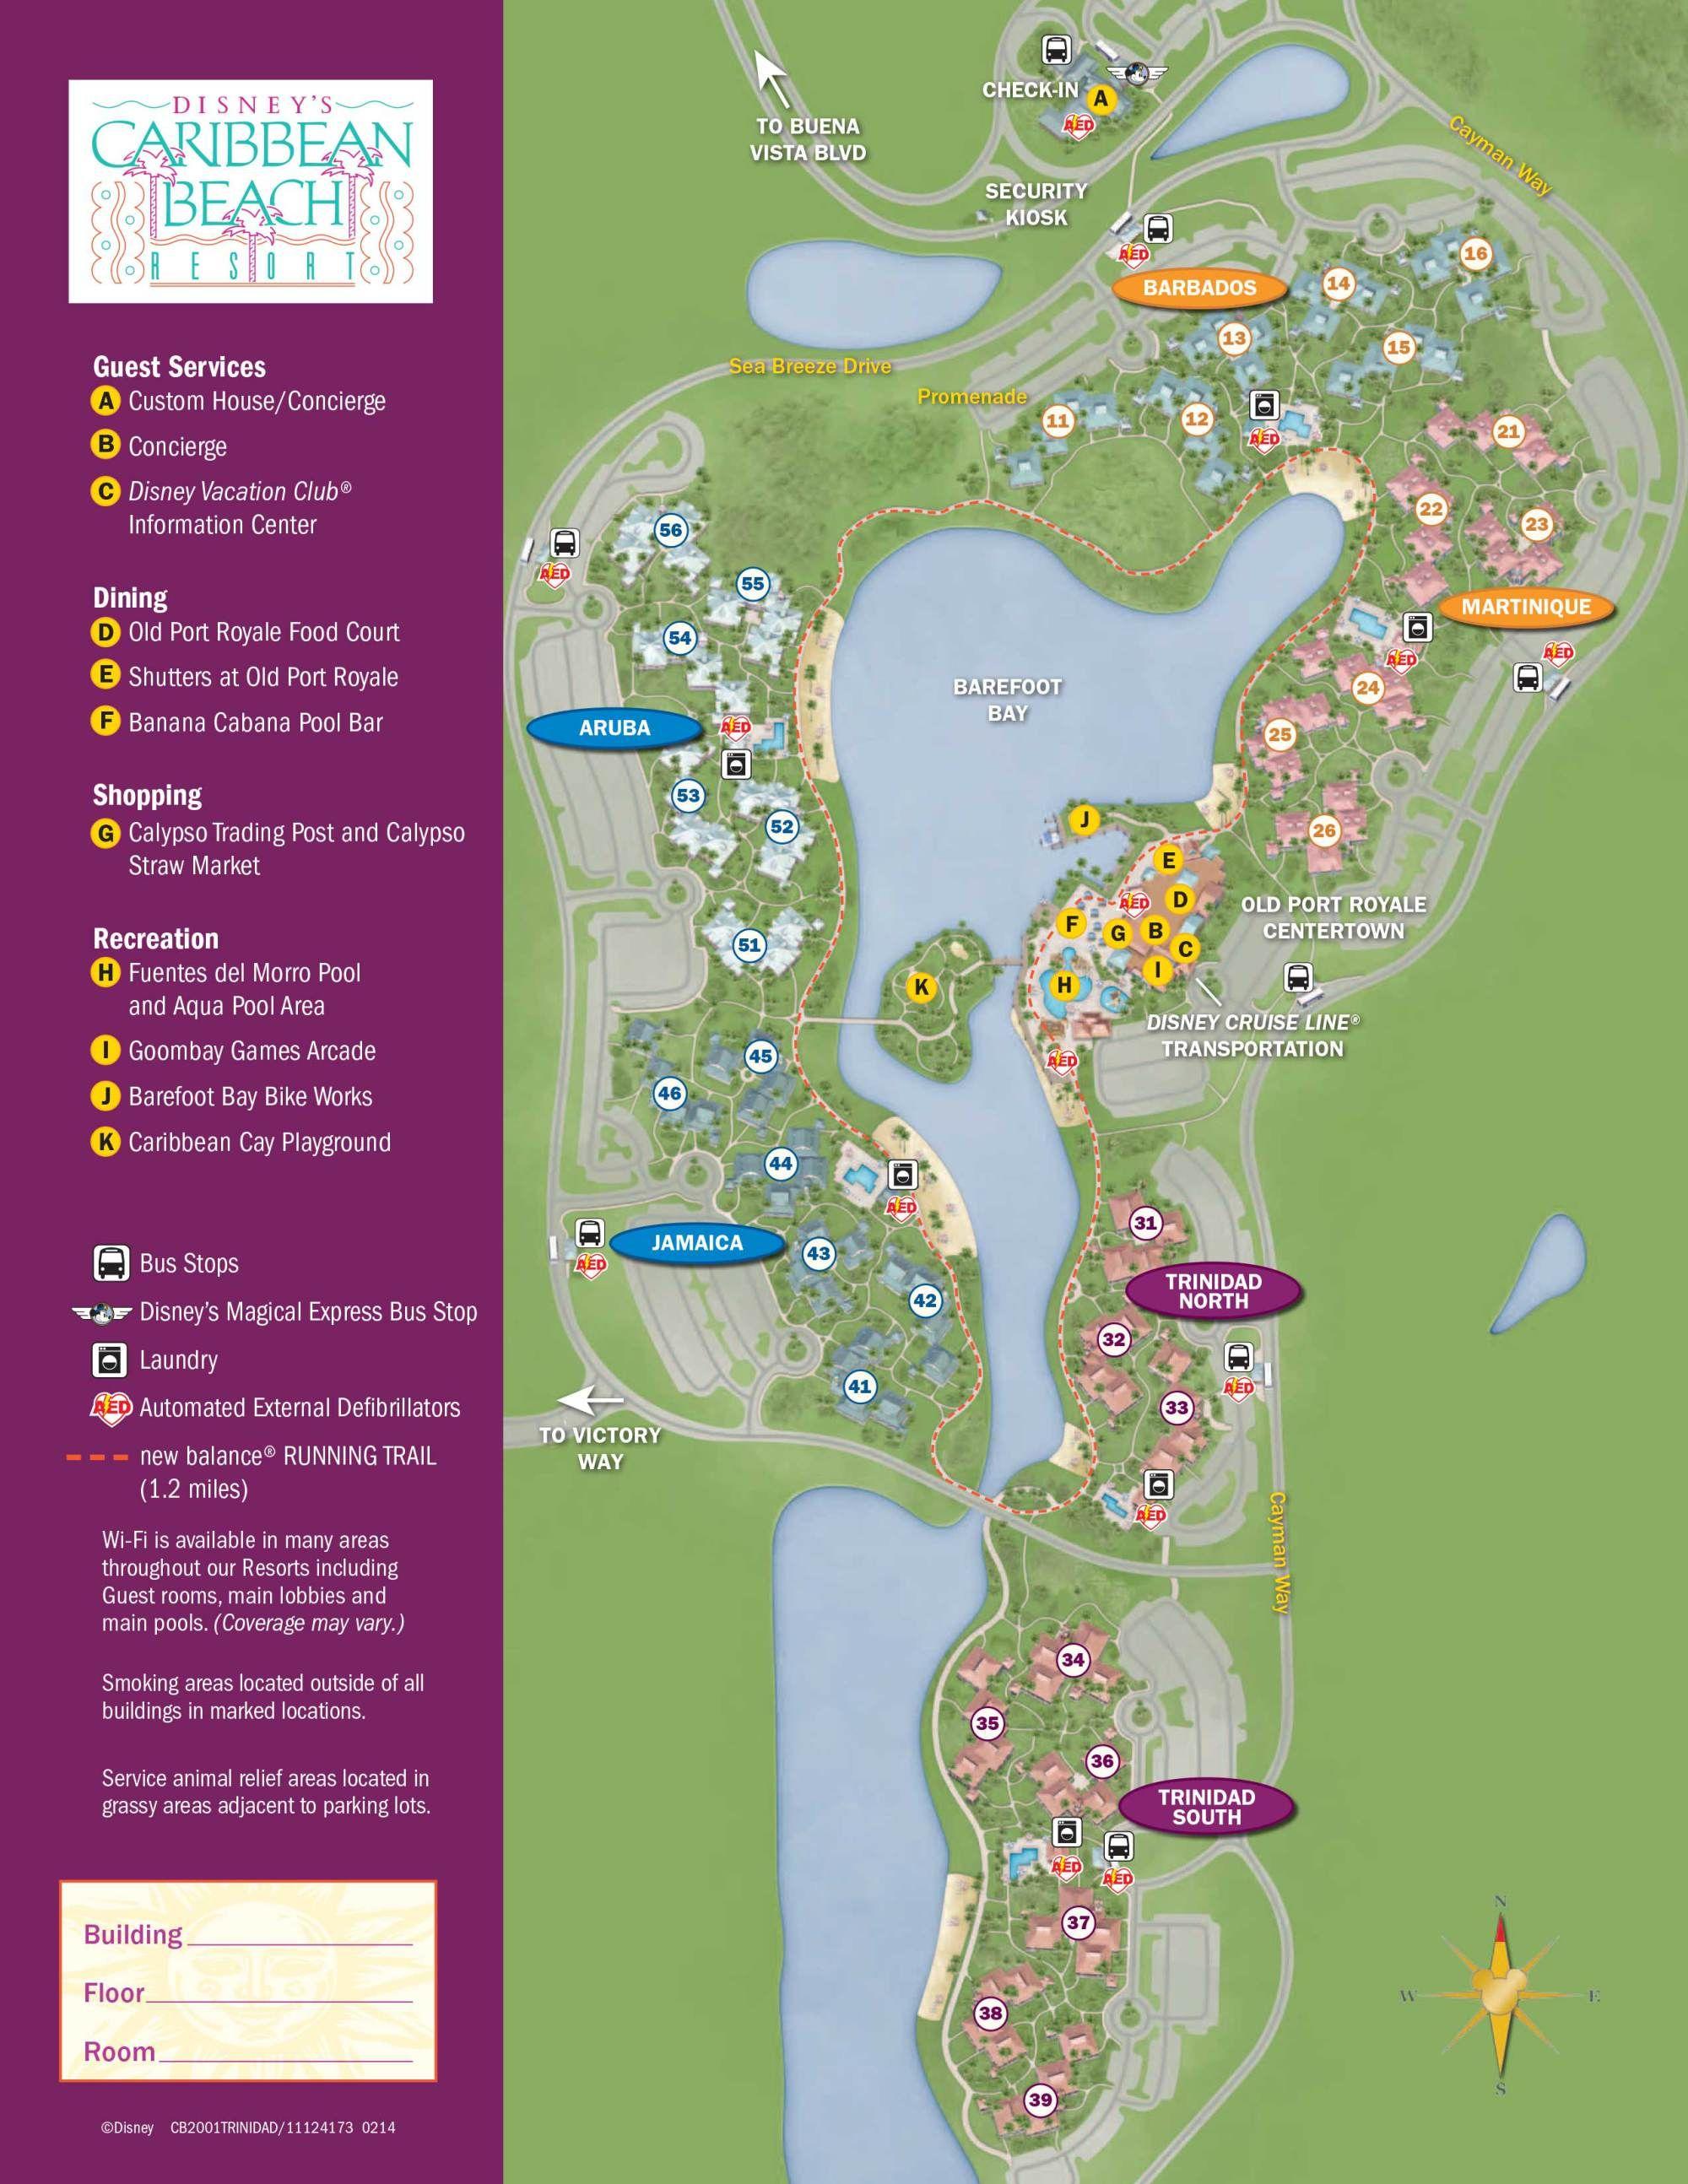 Caribbean Beach Resort Map | Disney Vacation | Caribbean Beach - Florida Resorts Map